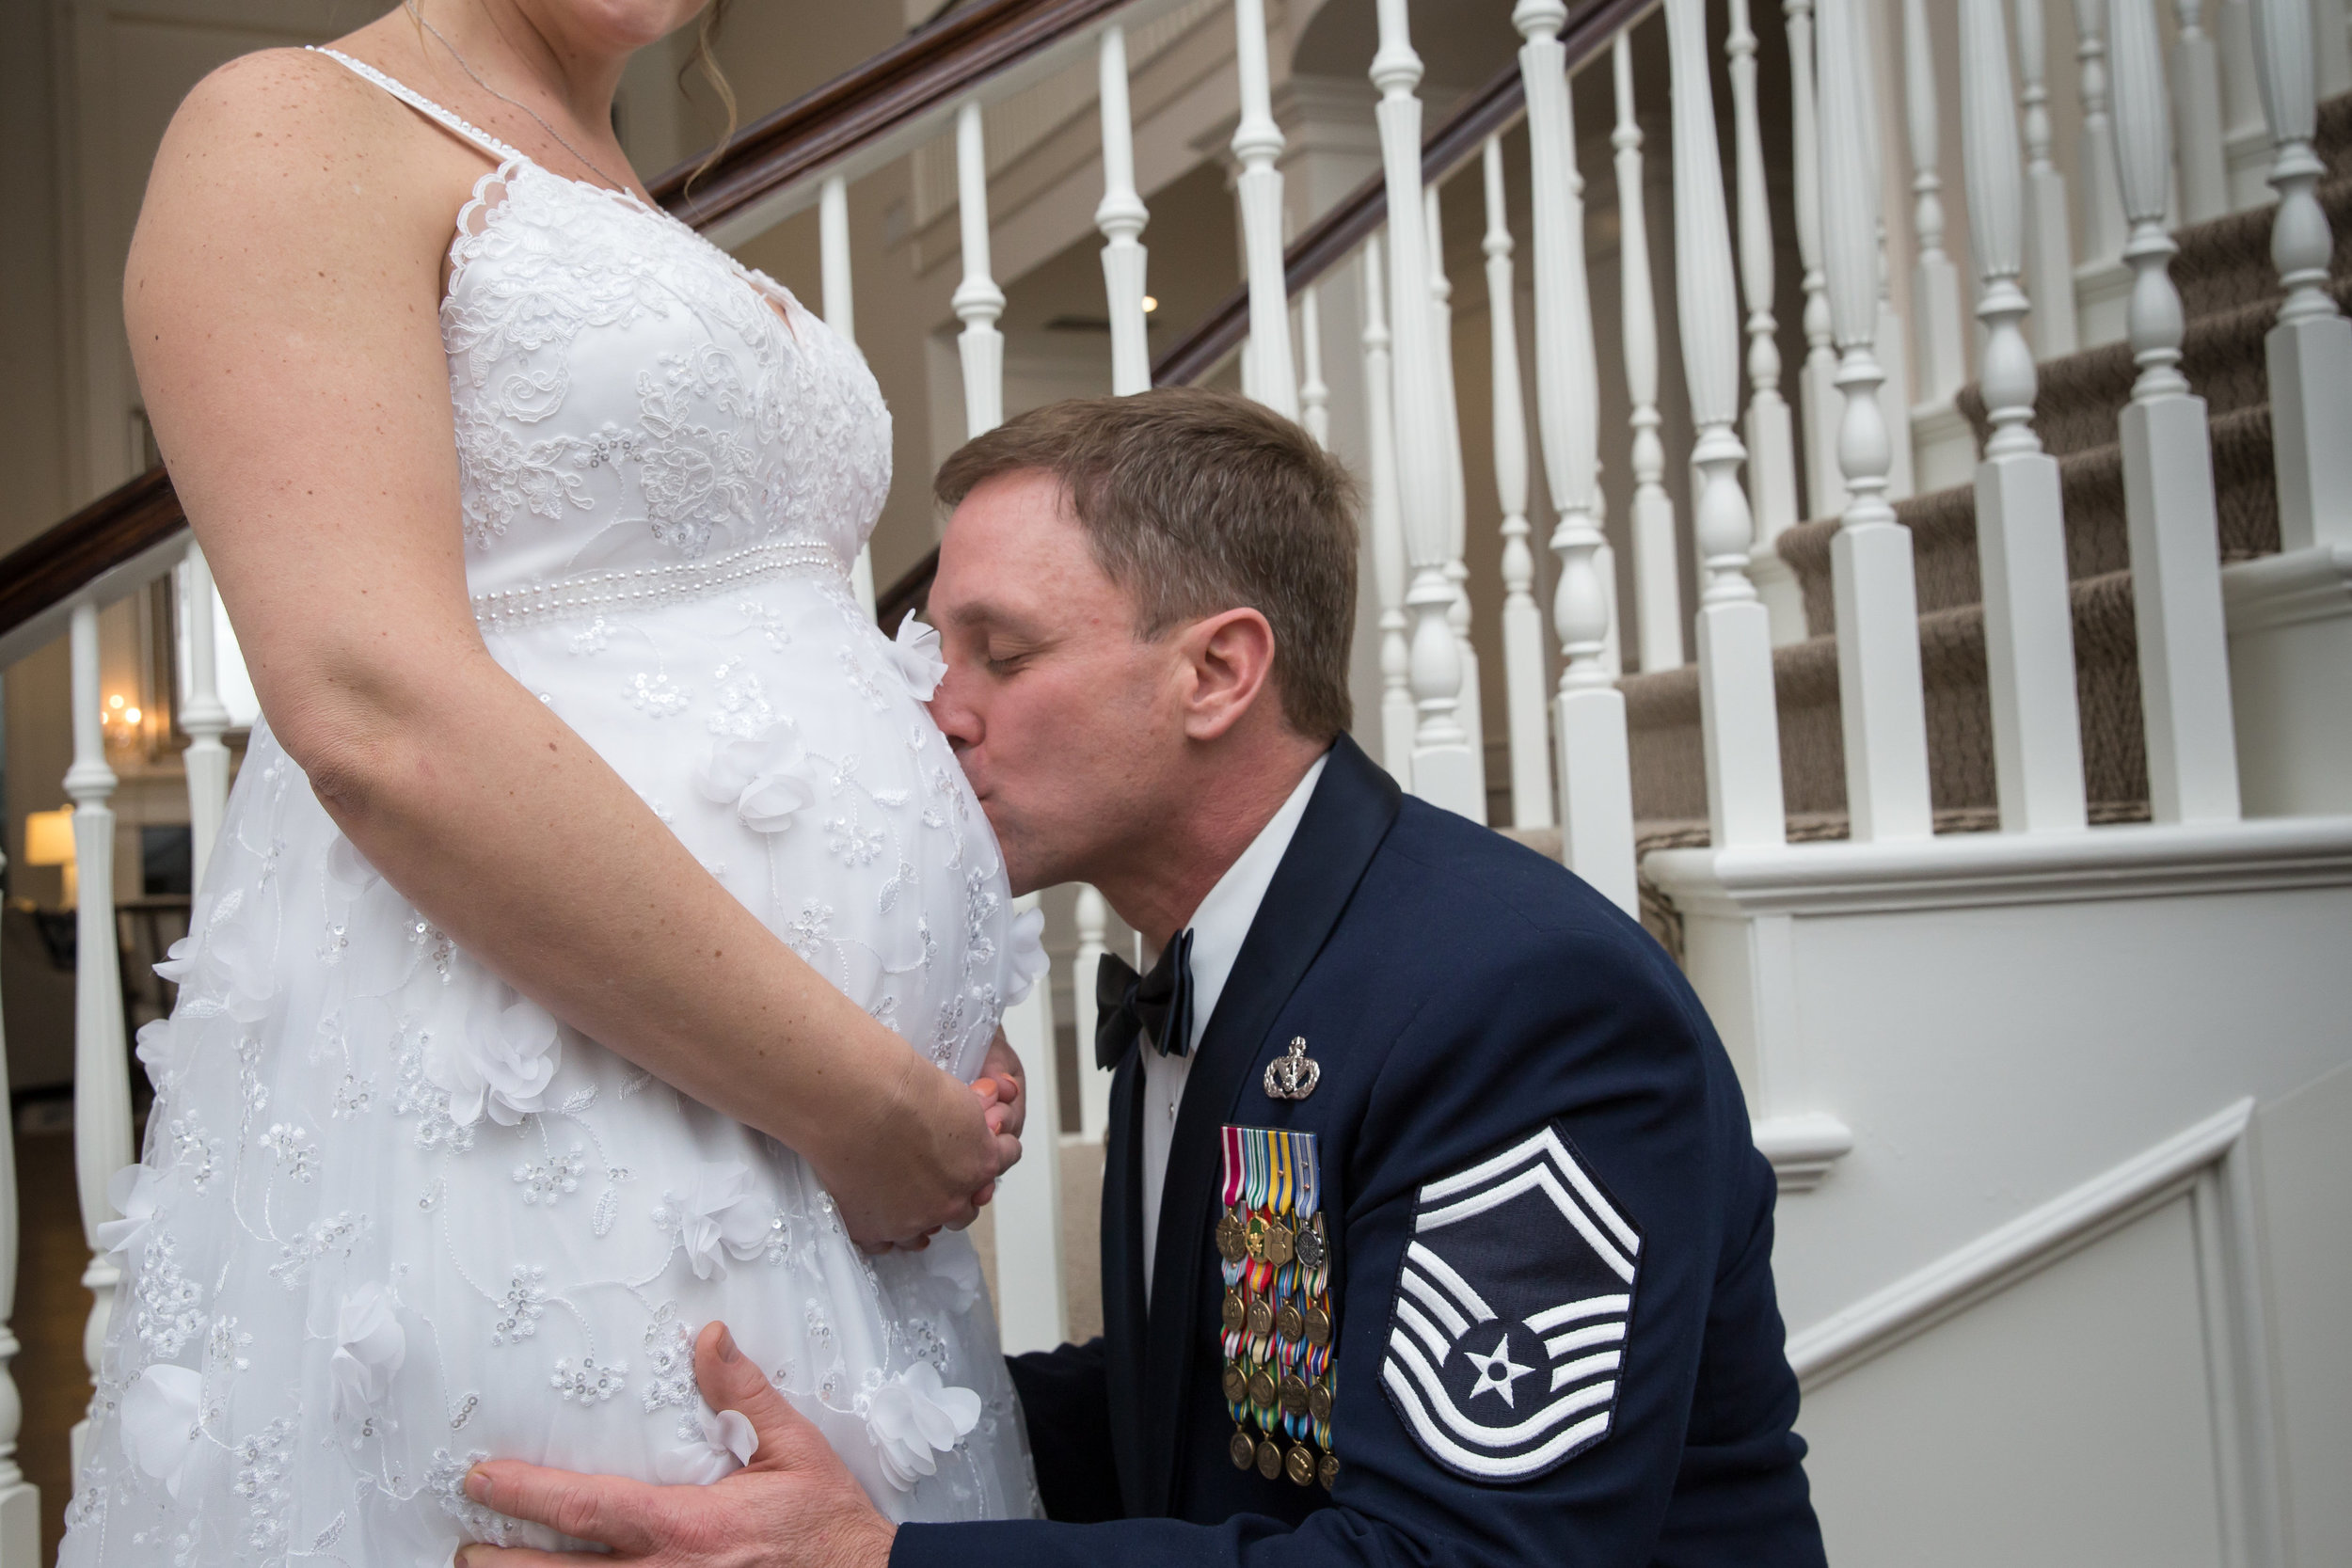 maternity wedding photo.jpg